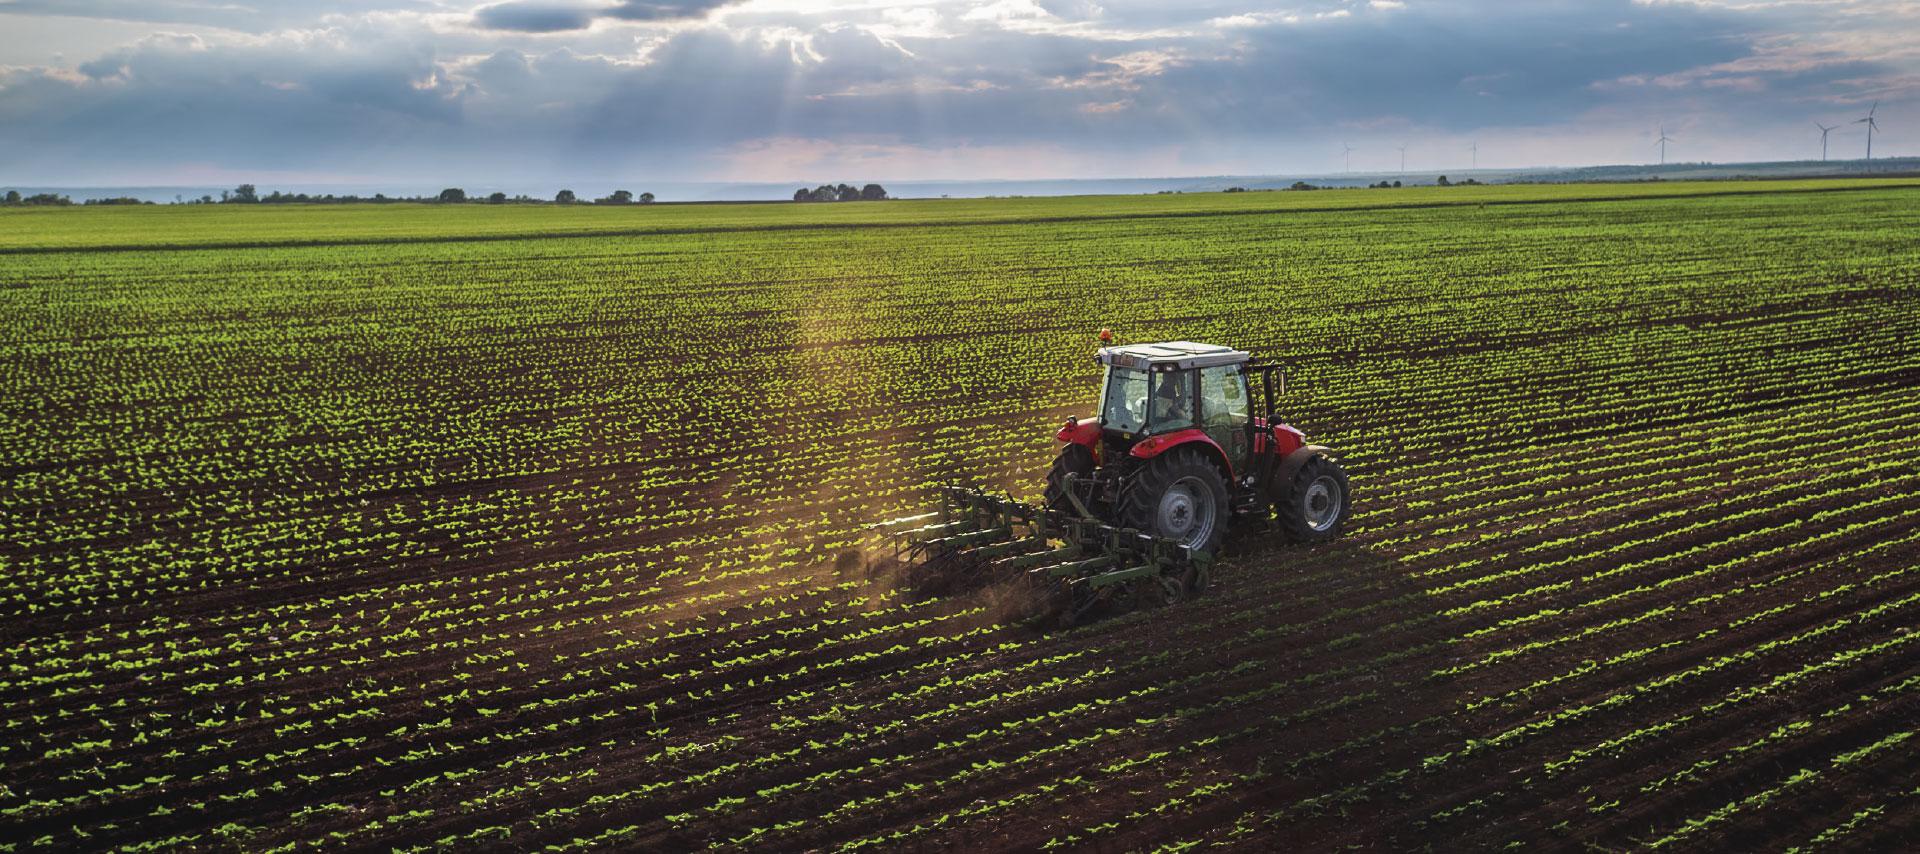 https://www.lacesenate.it/wp-content/uploads/2020/11/agricoltura.jpg